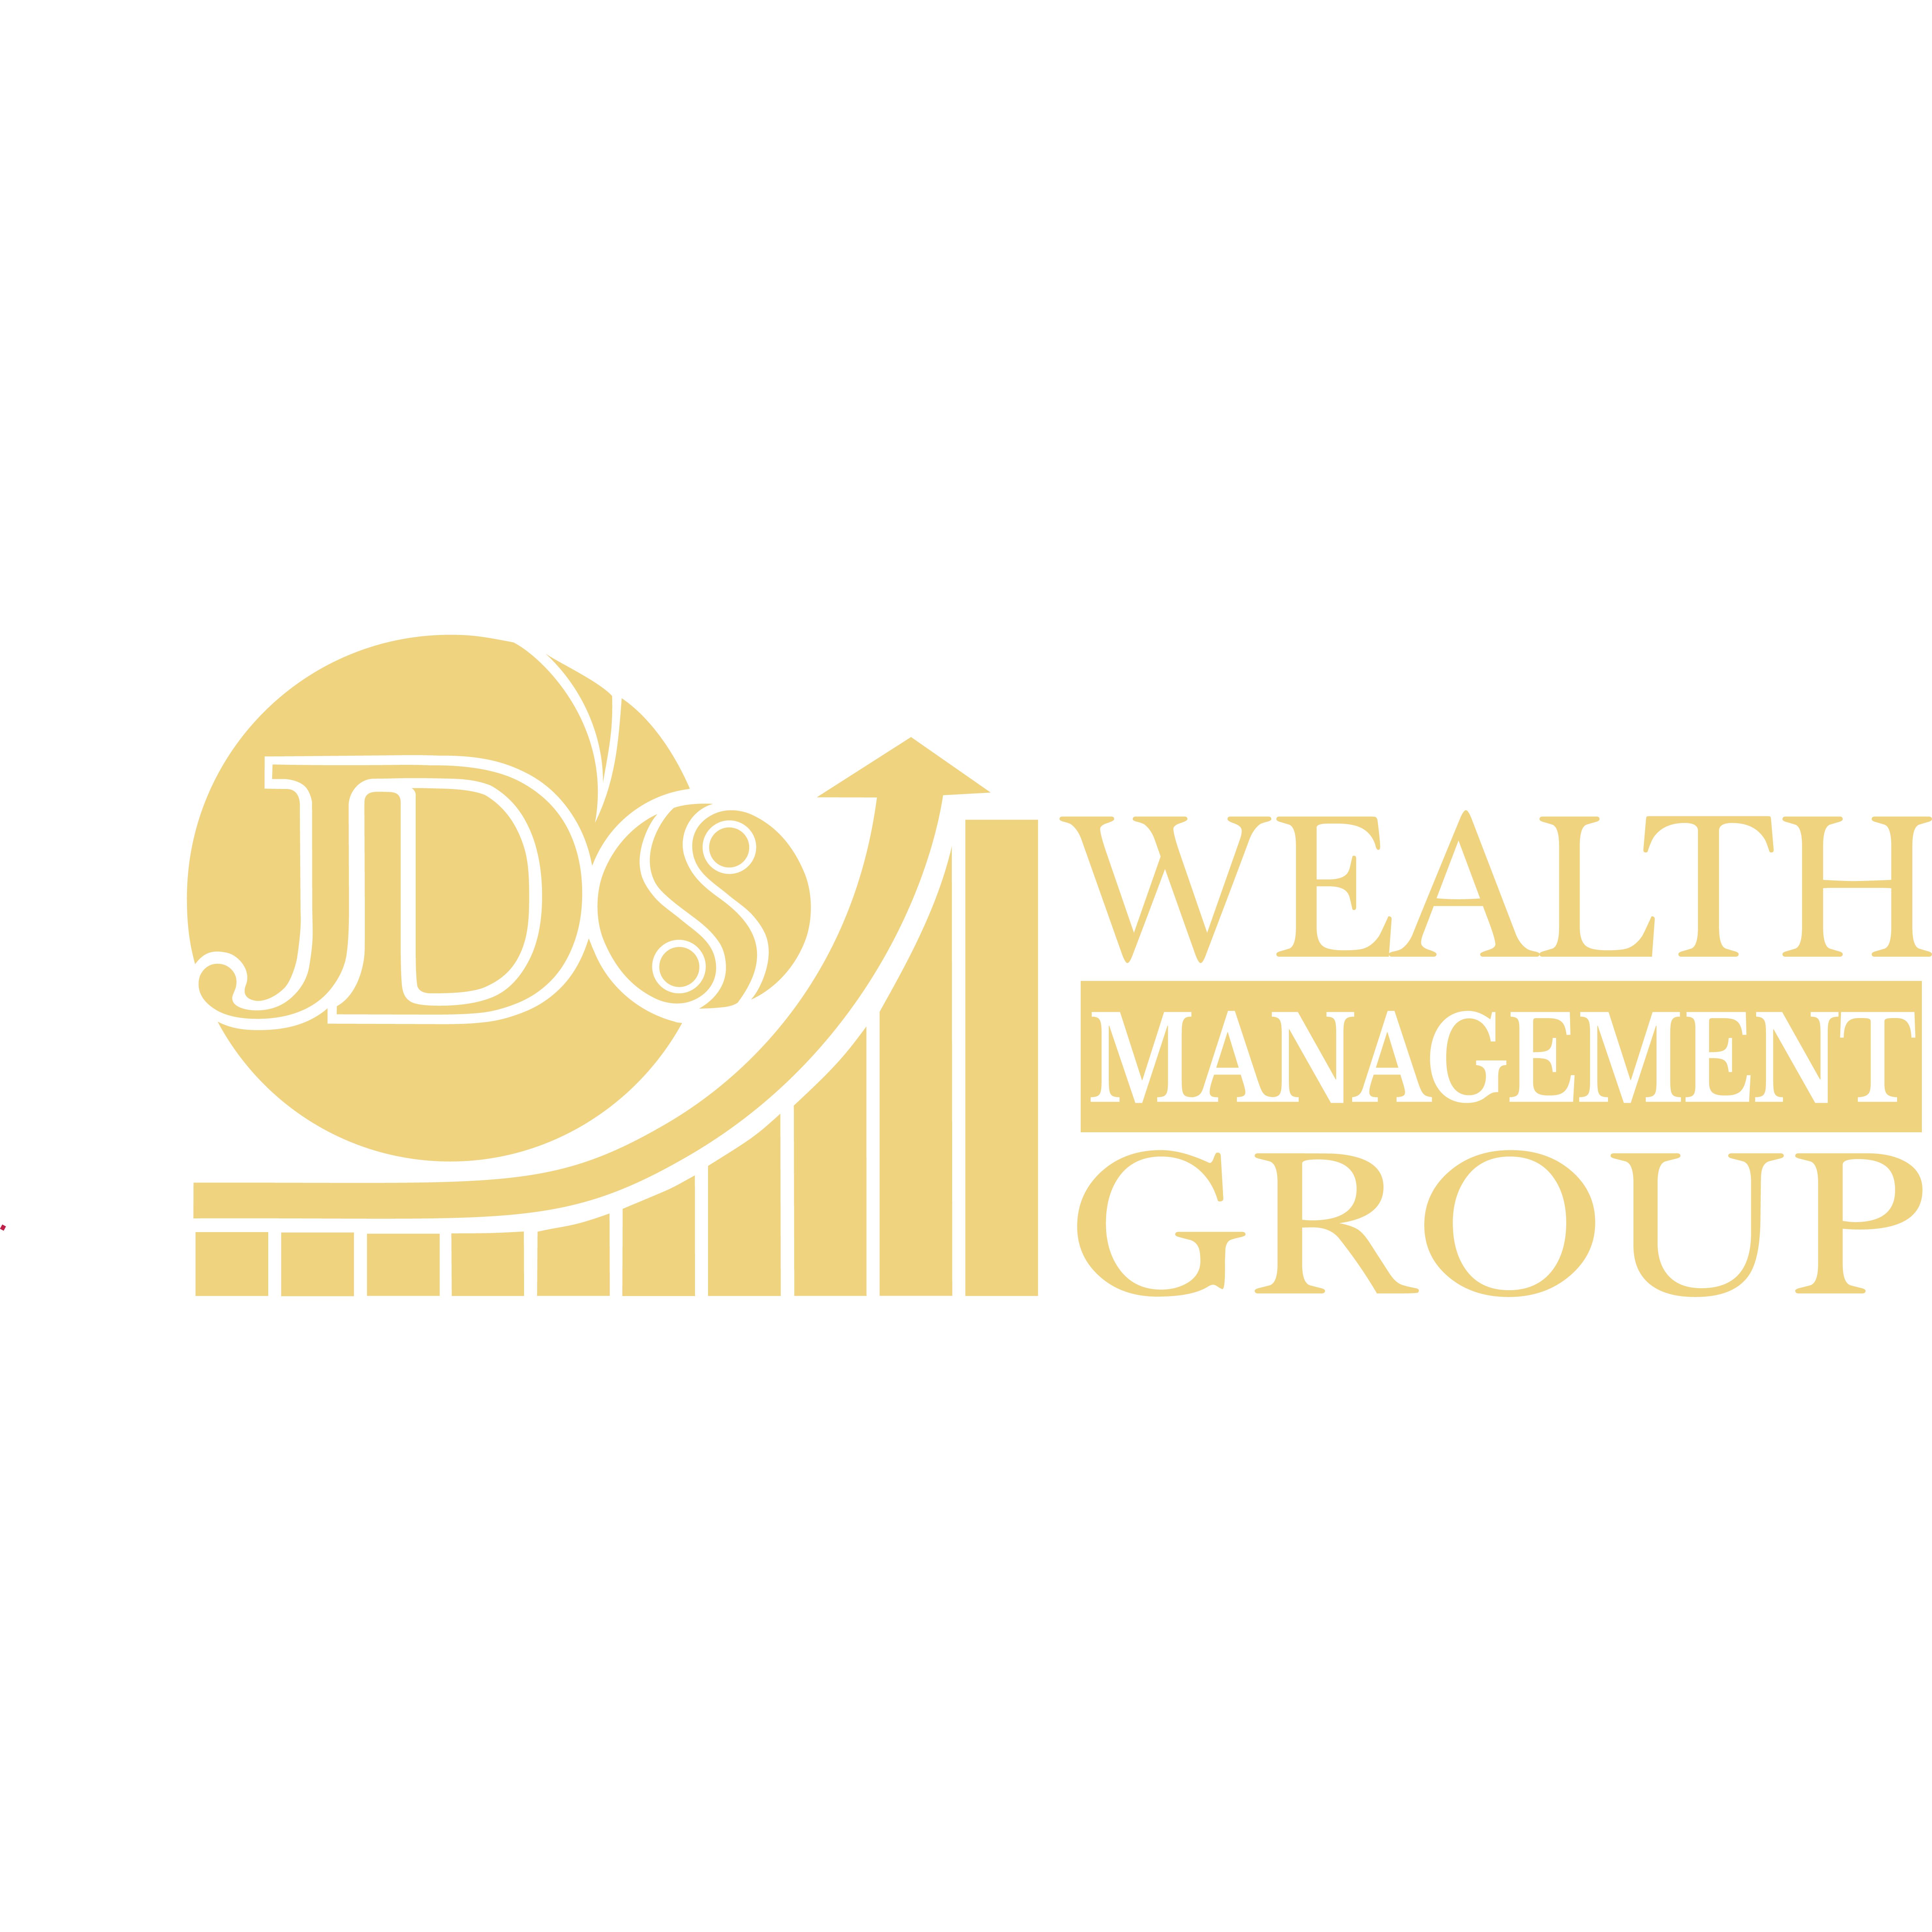 JD's Wealth Management Group image 2